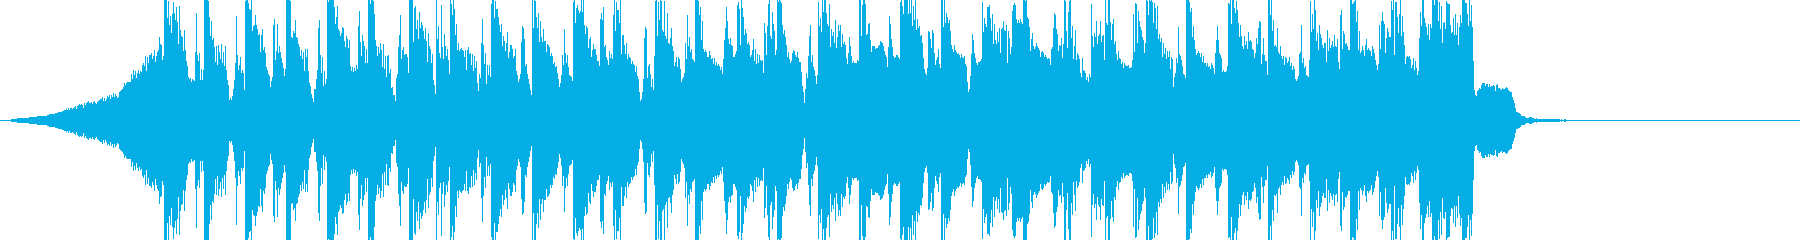 Happy Ukuelele 2の再生済みの波形